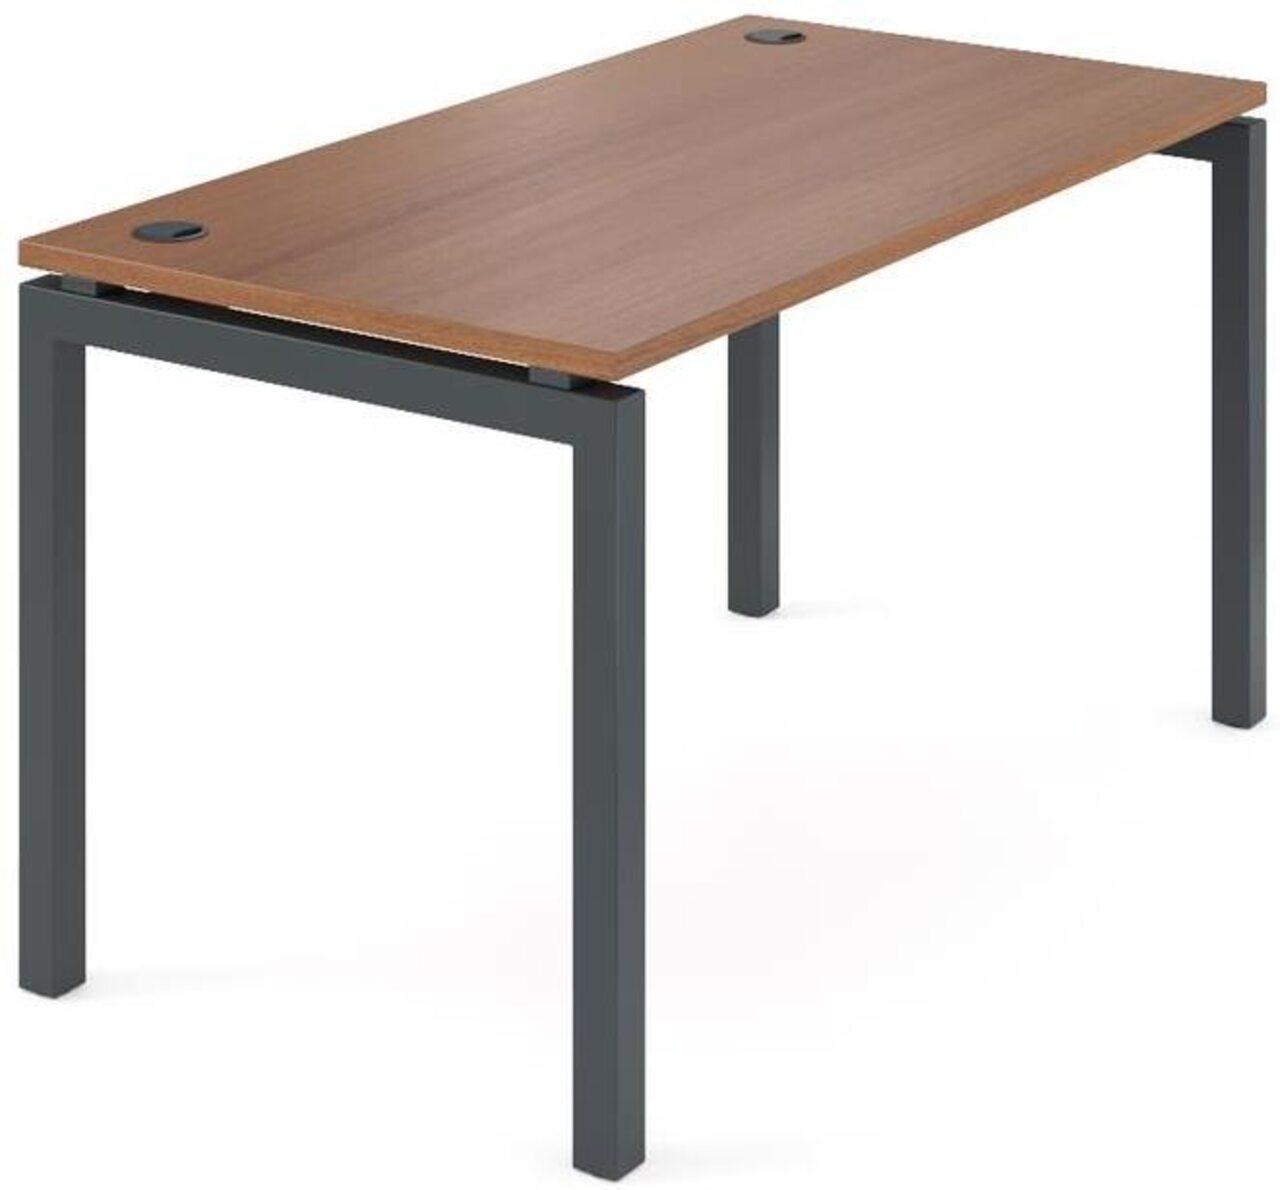 Стол на металлокаркасе  Арго 140x73x76 - фото 2